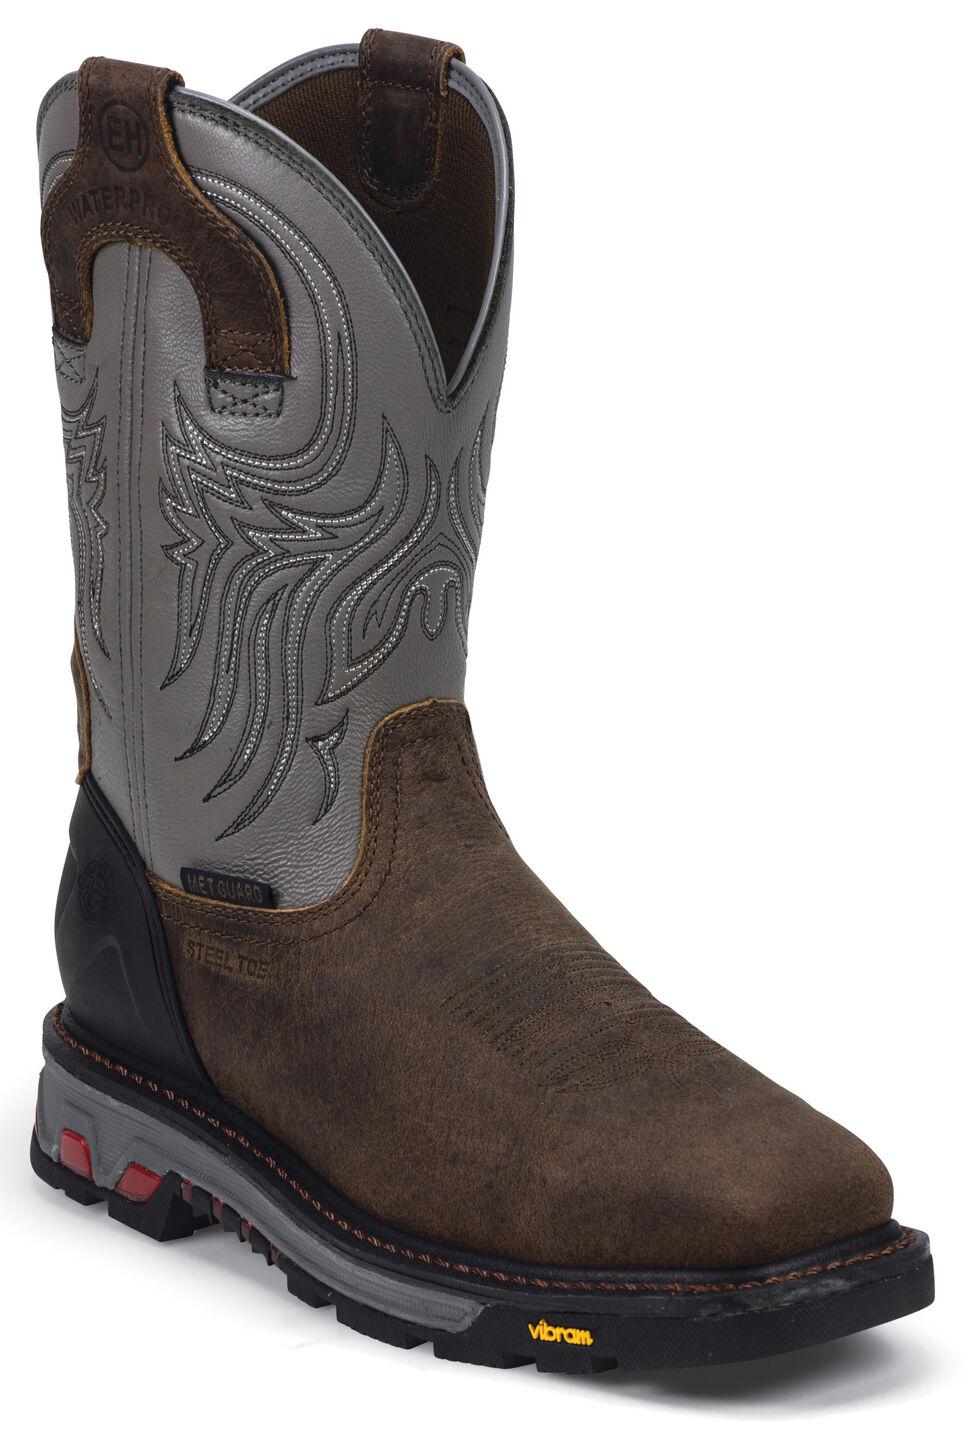 Justin Men's Tanker Silver EH Waterproof MetGuard Work Boots - Steel Toe, Timber, hi-res